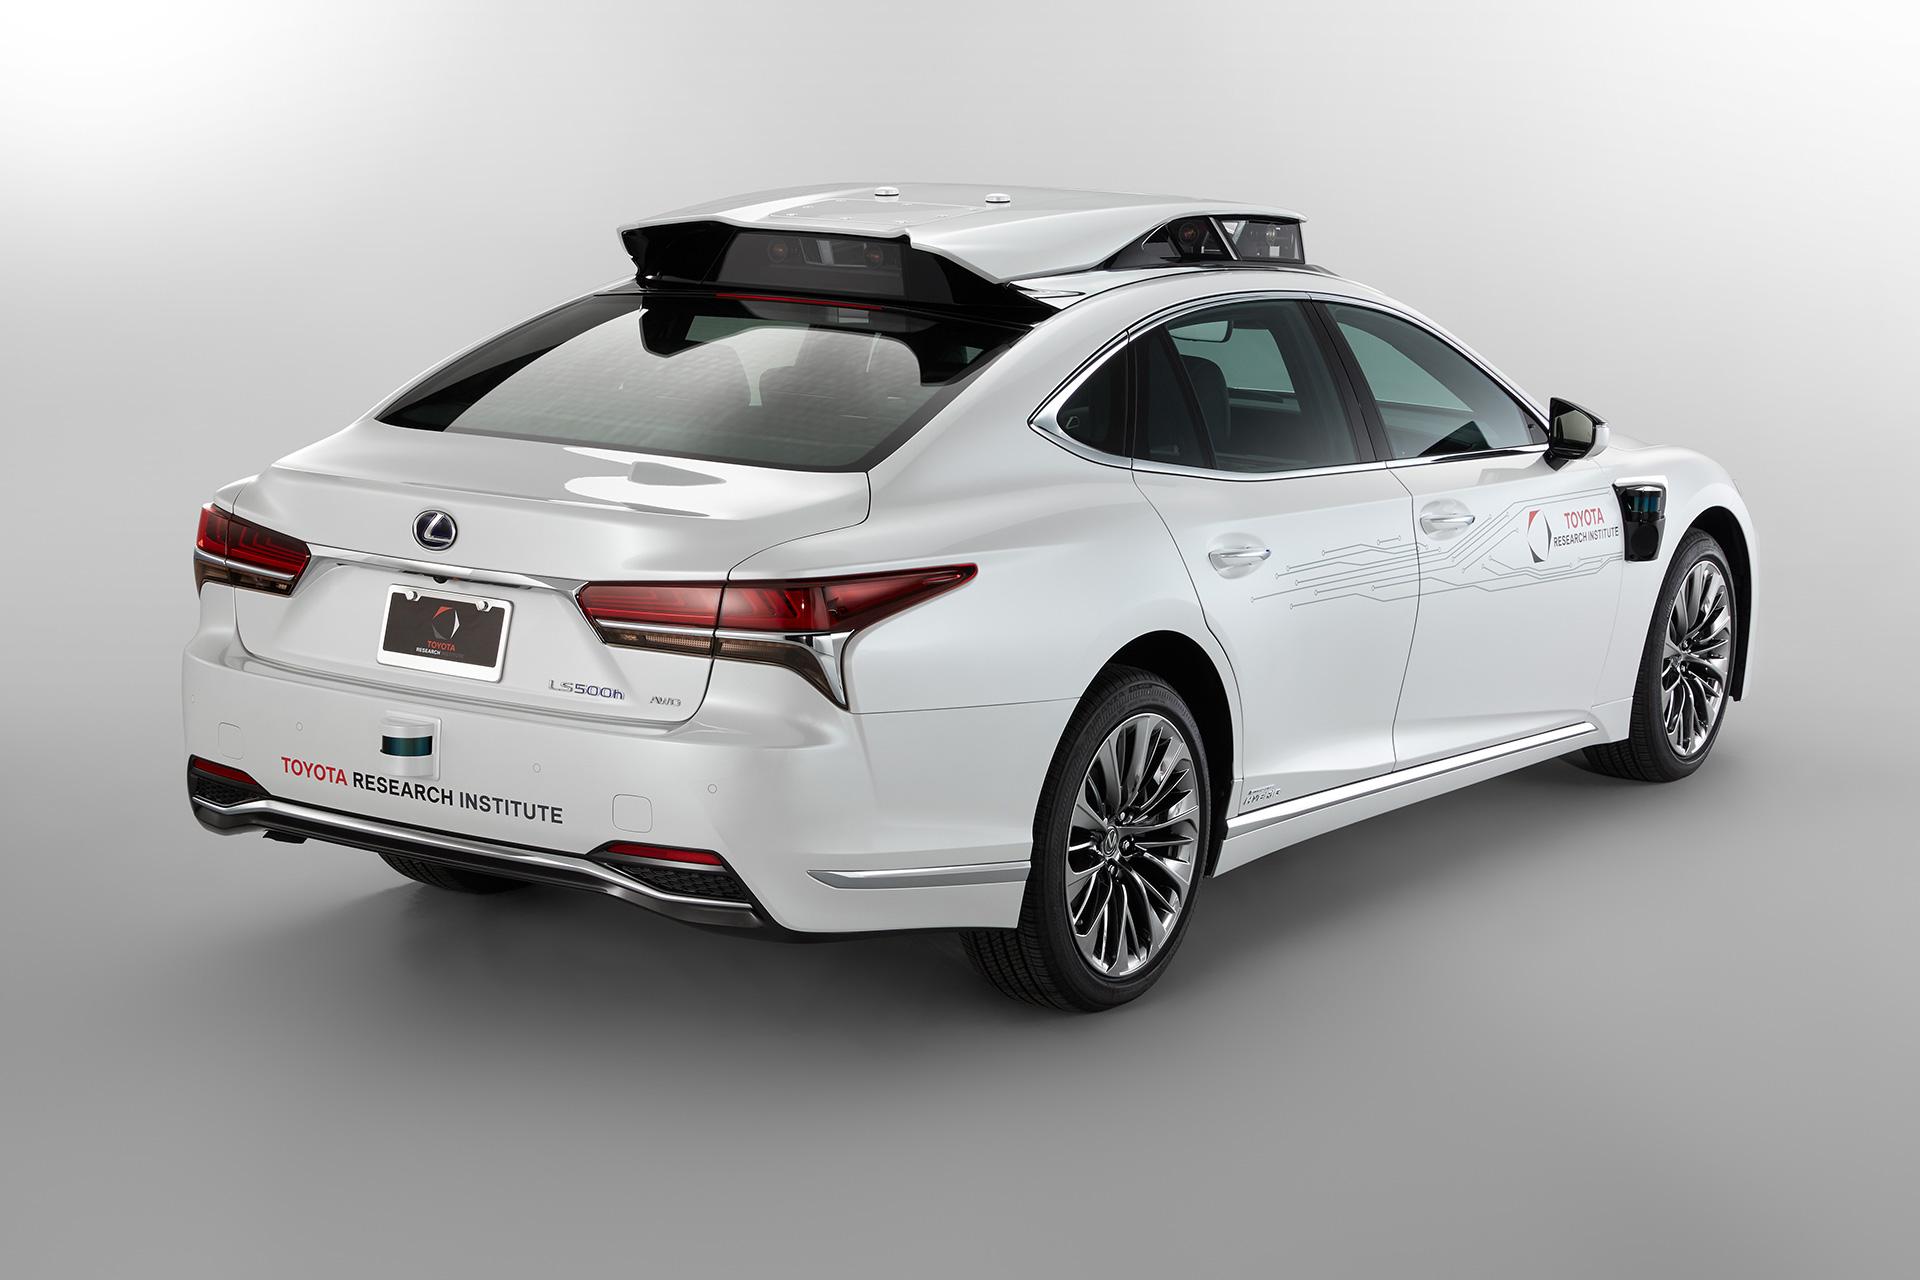 「【CES 2019】新型レクサスLSをベースとした自動運転実験車「TRI-P4」を披露」の10枚目の画像